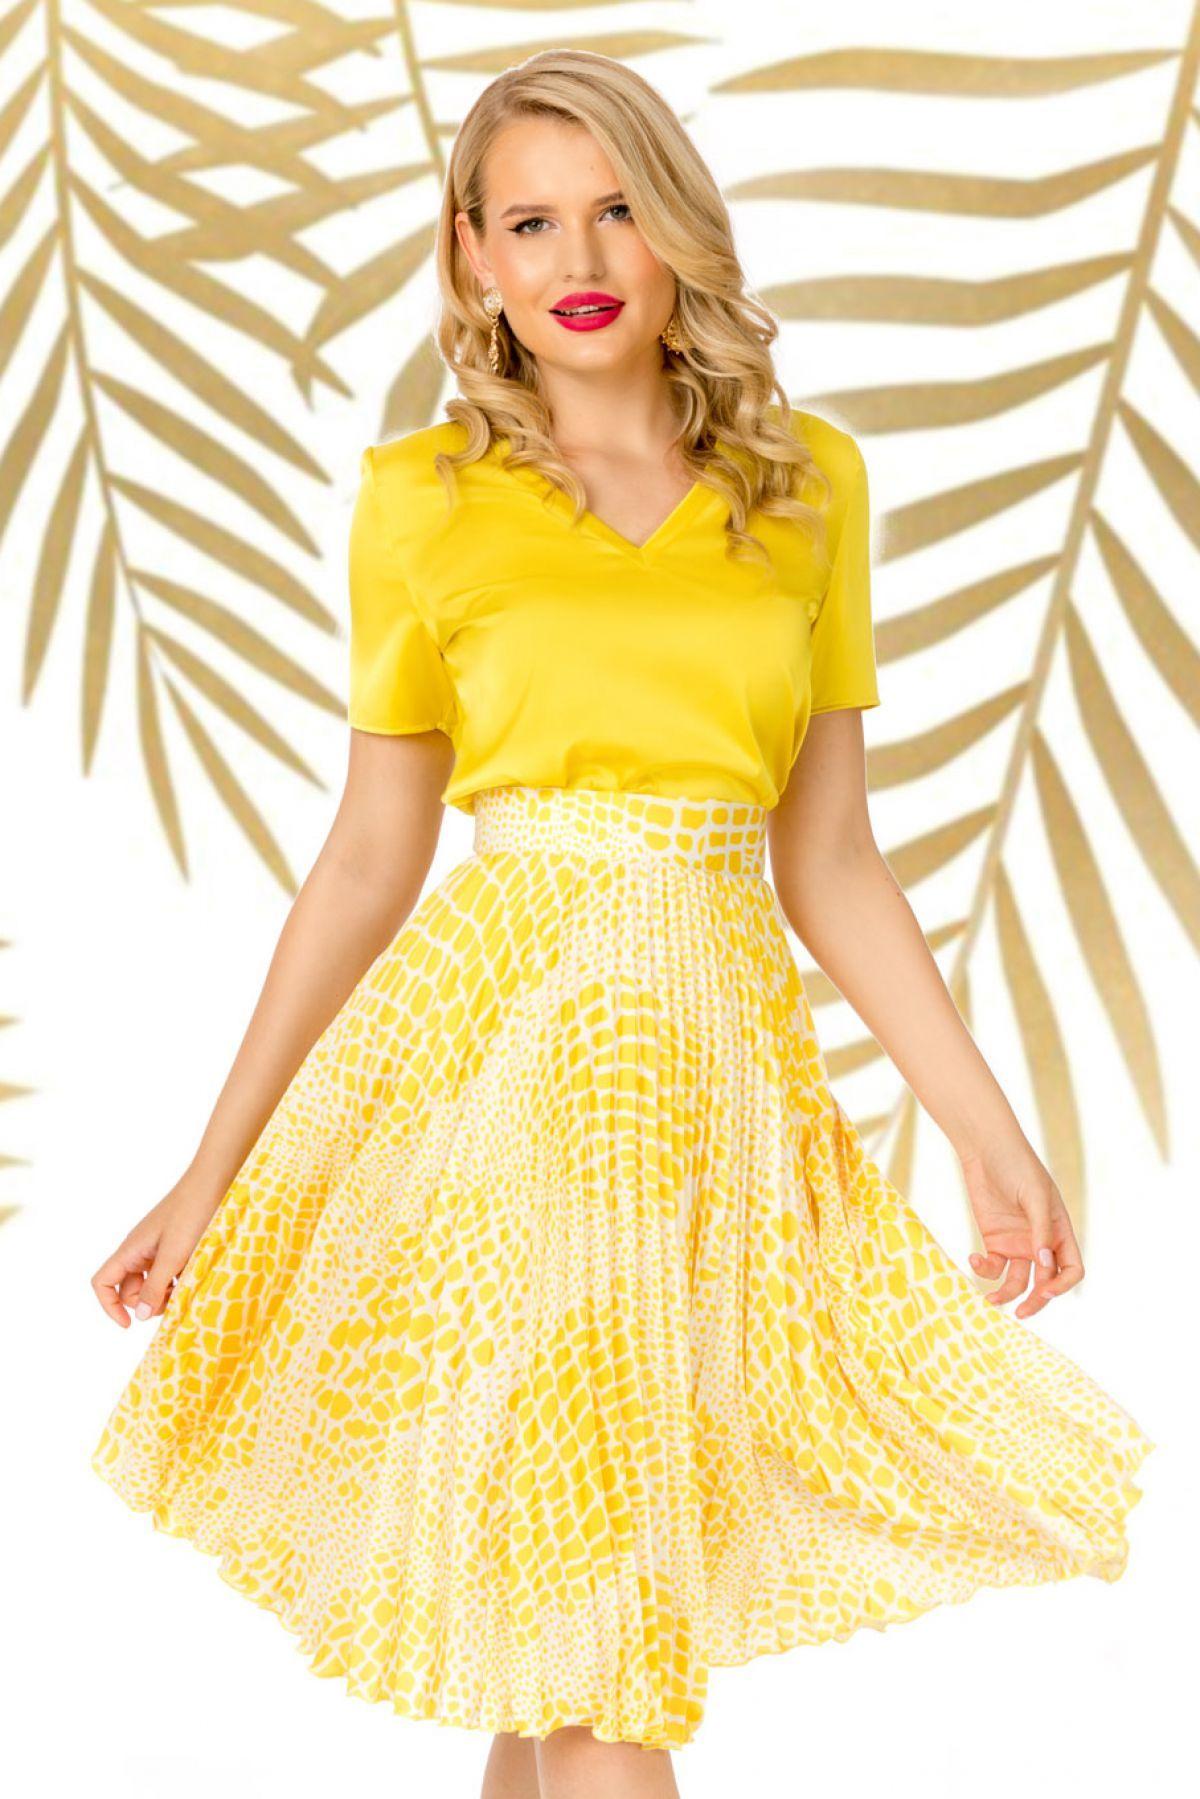 Fusta Pretty Girl plisata cu imprimeu galben tip sarpe